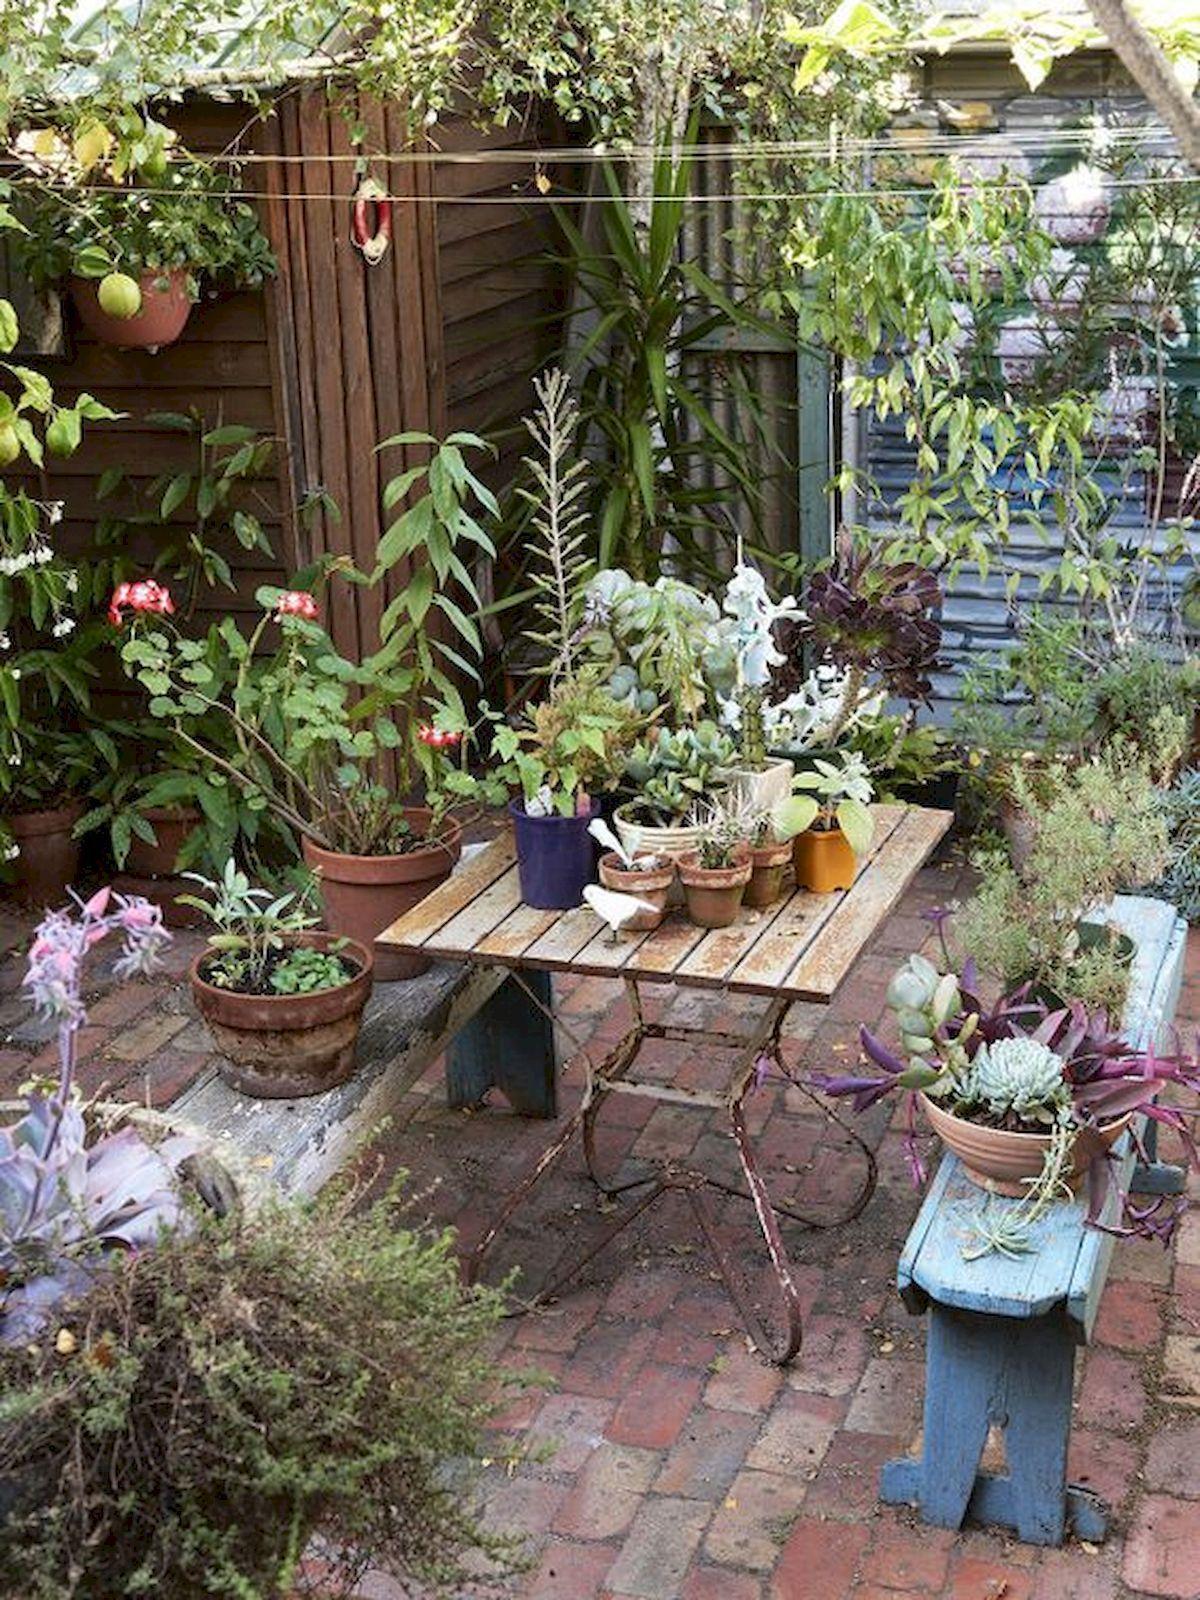 35 Seriously Jaw Dropping Urban Gardens Ideas (10 | Small ... on Small Urban Patio Ideas id=89544